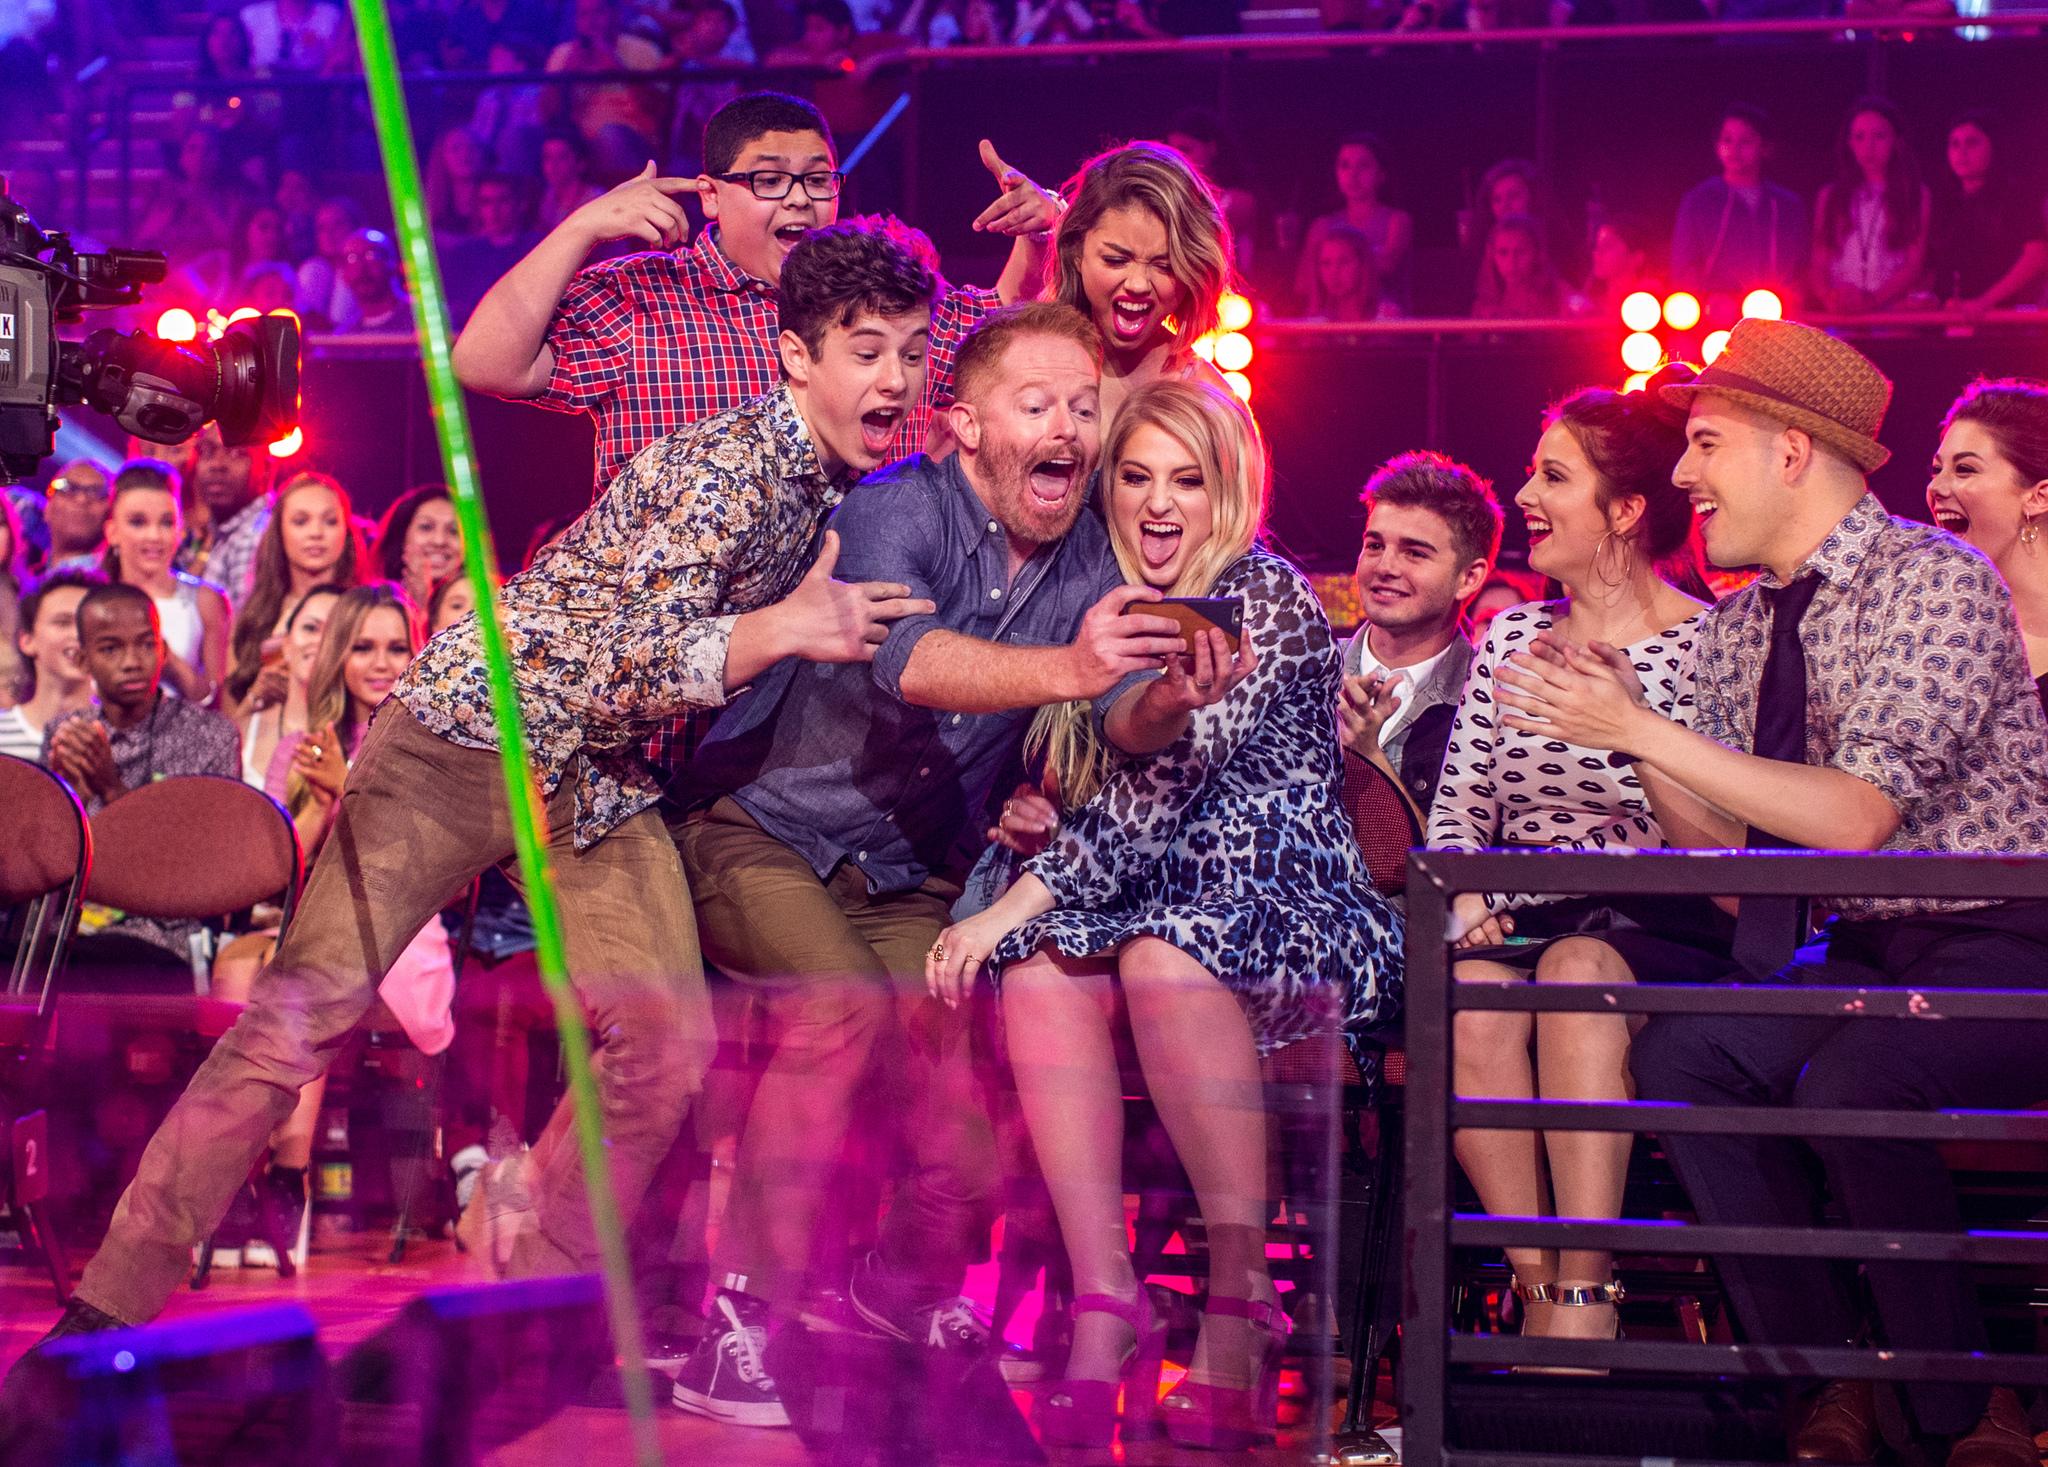 Jesse Tyler Ferguson, Sarah Hyland, Ariel Winter, Nolan Gould, Rico Rodriguez and Meghan Trainor at event of Nickelodeon Kids' Choice Awards 2015 (2015)